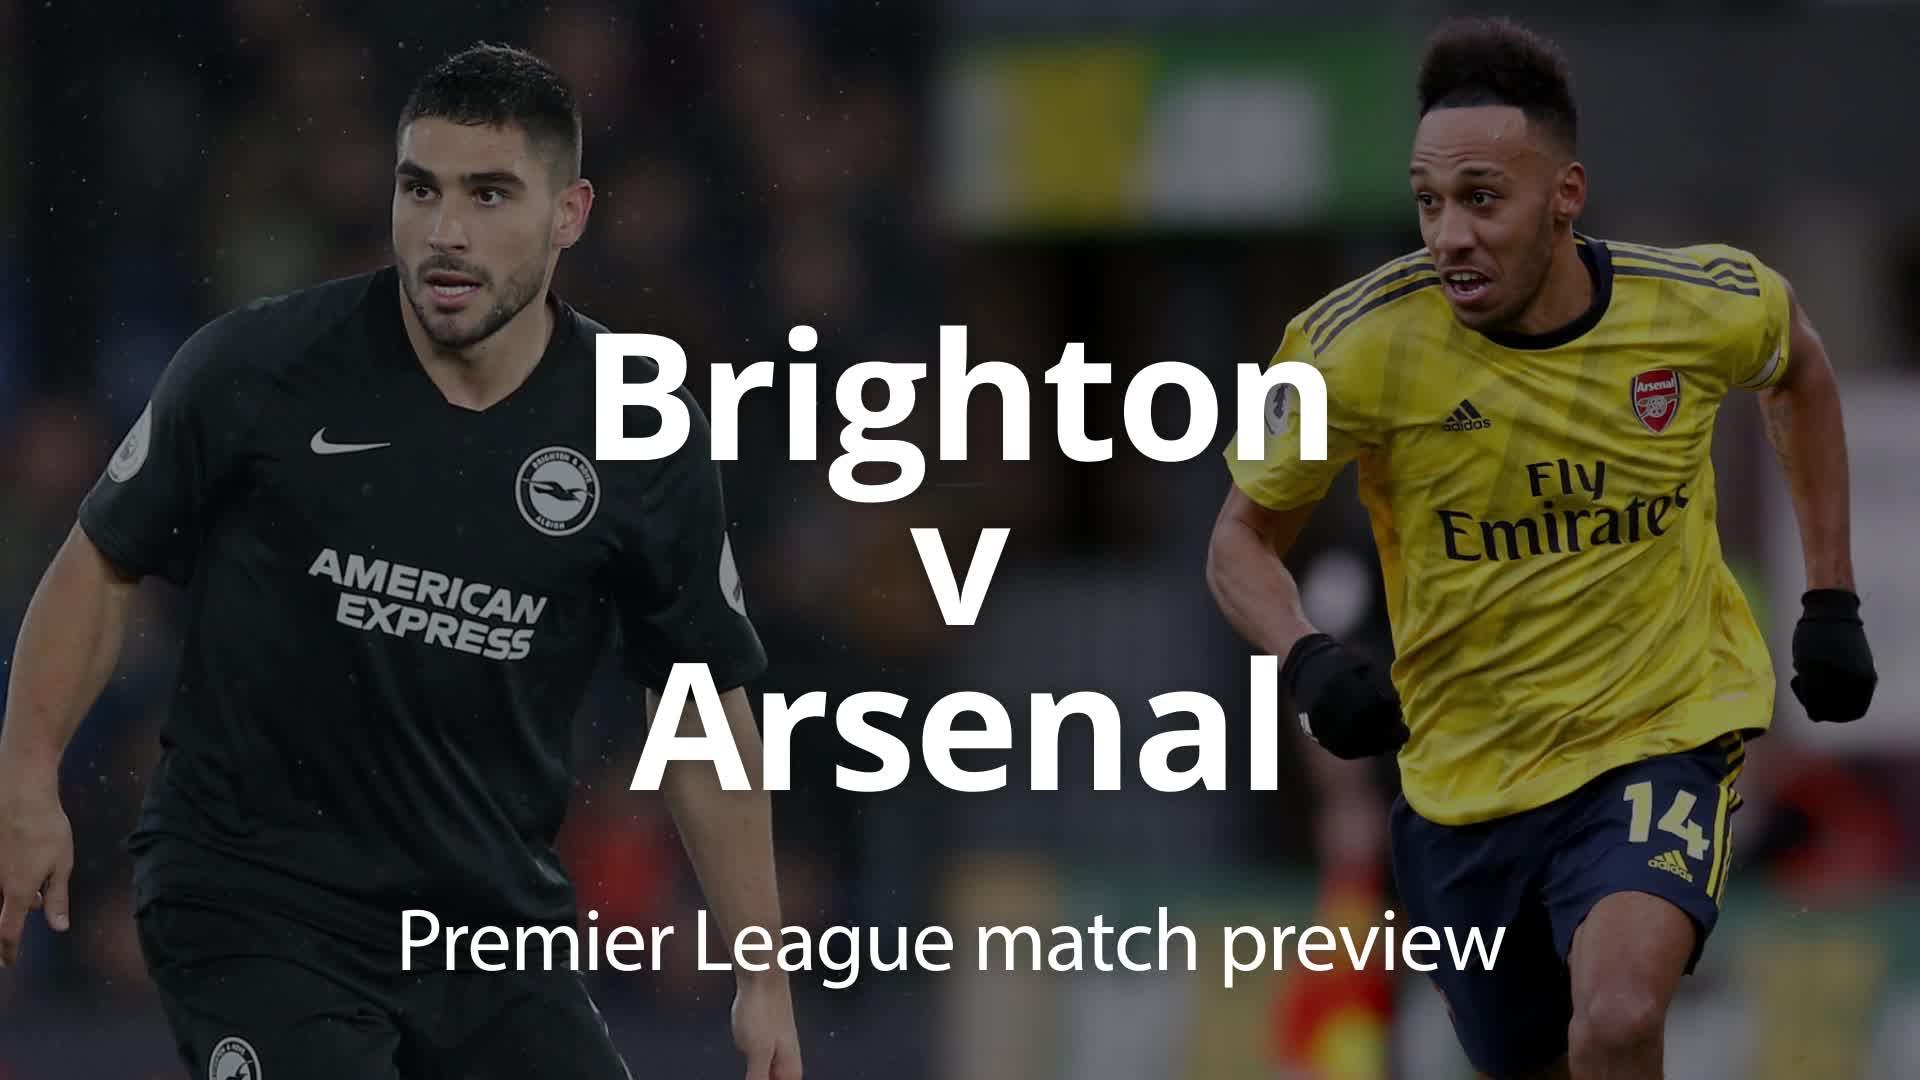 Premier League match preview: Brighton v Arsenal